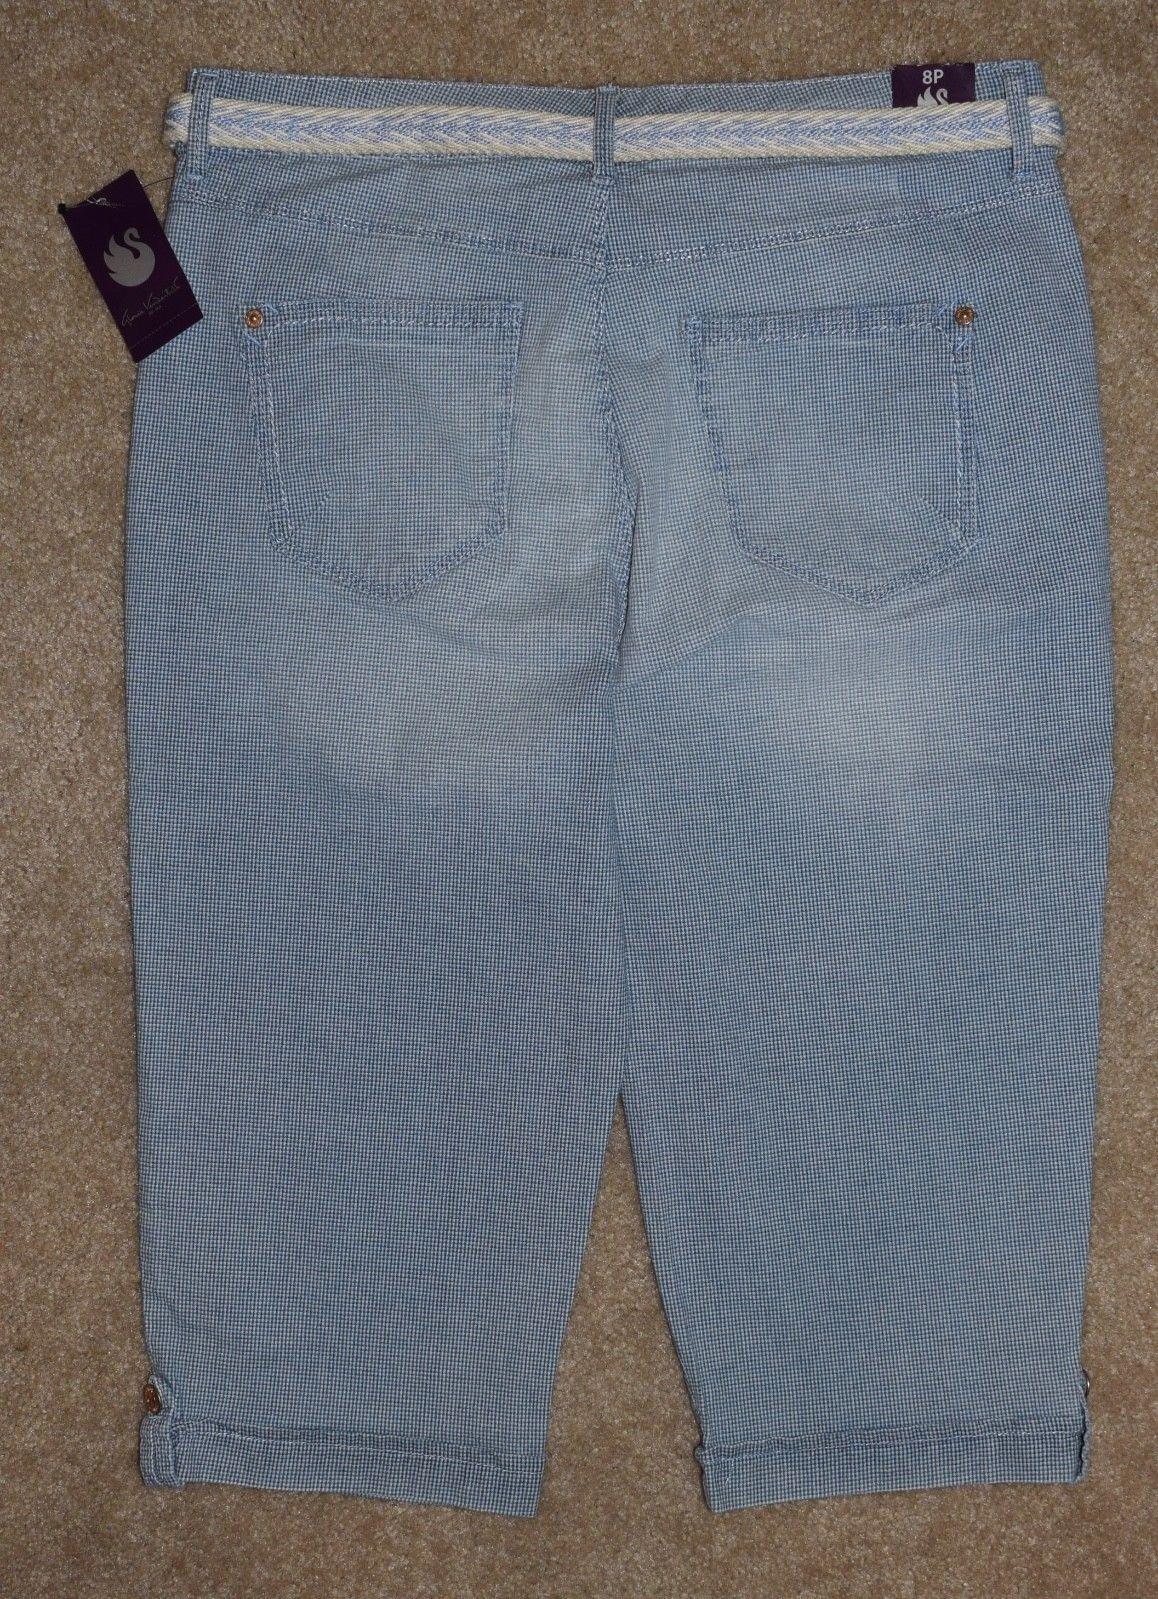 New Gloria Vanderbilt 8P Jeans Skimmer Capris Marbella Belted Slimming Stretch